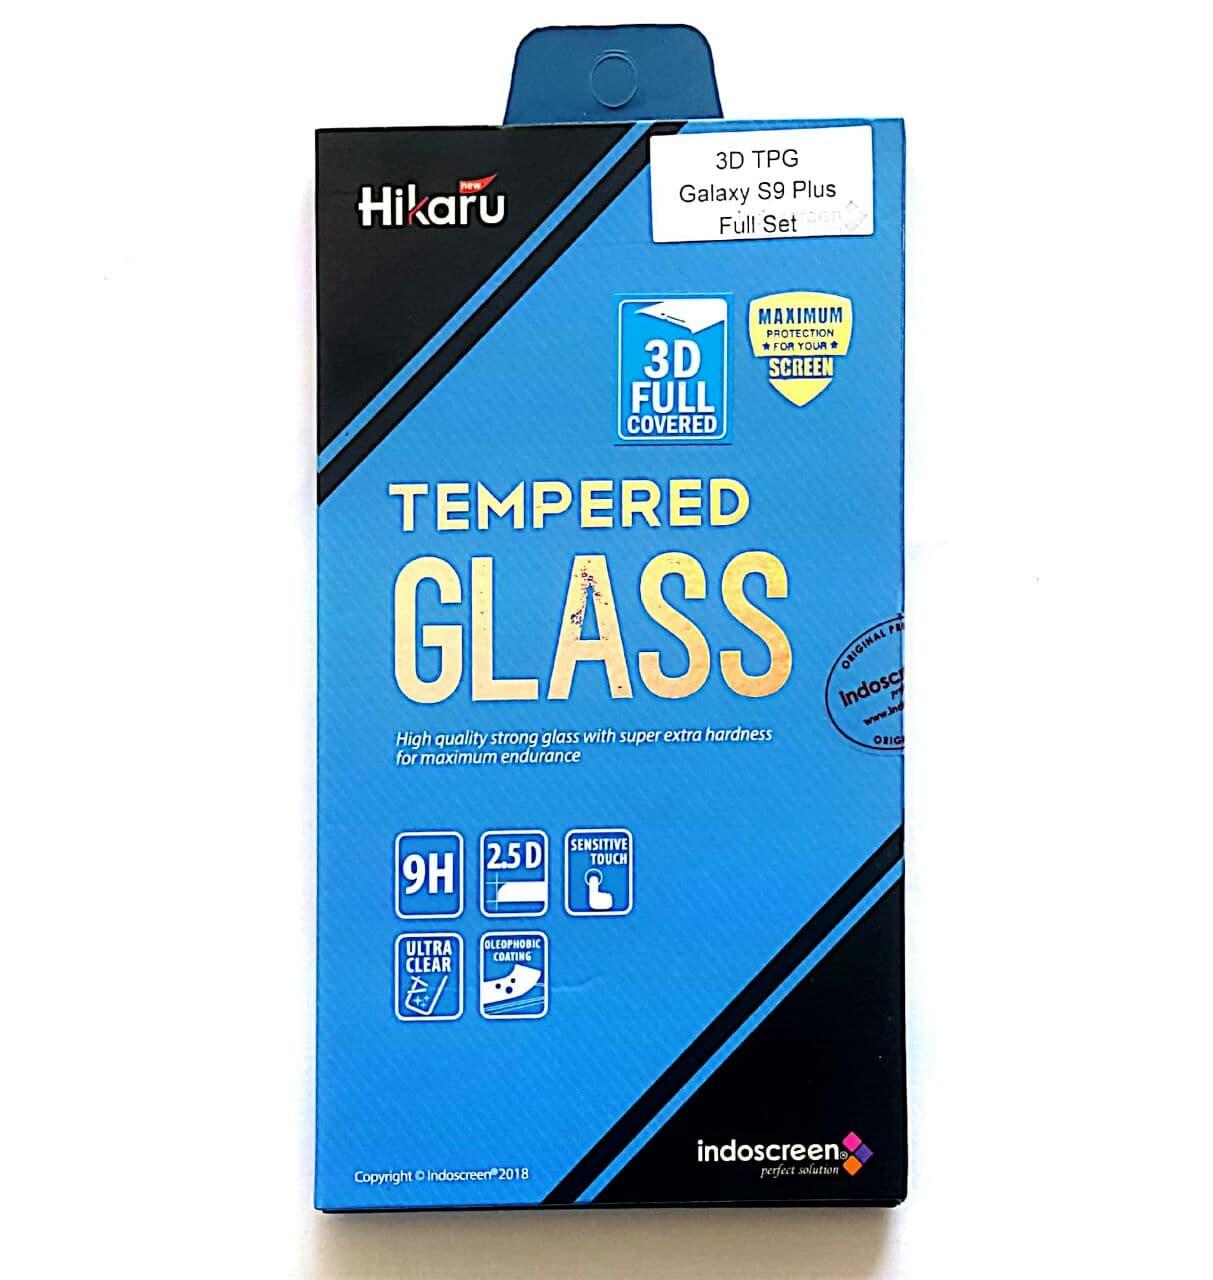 Jual HIKARU Tempered Glass 3D full cover Galaxy S9 Plus